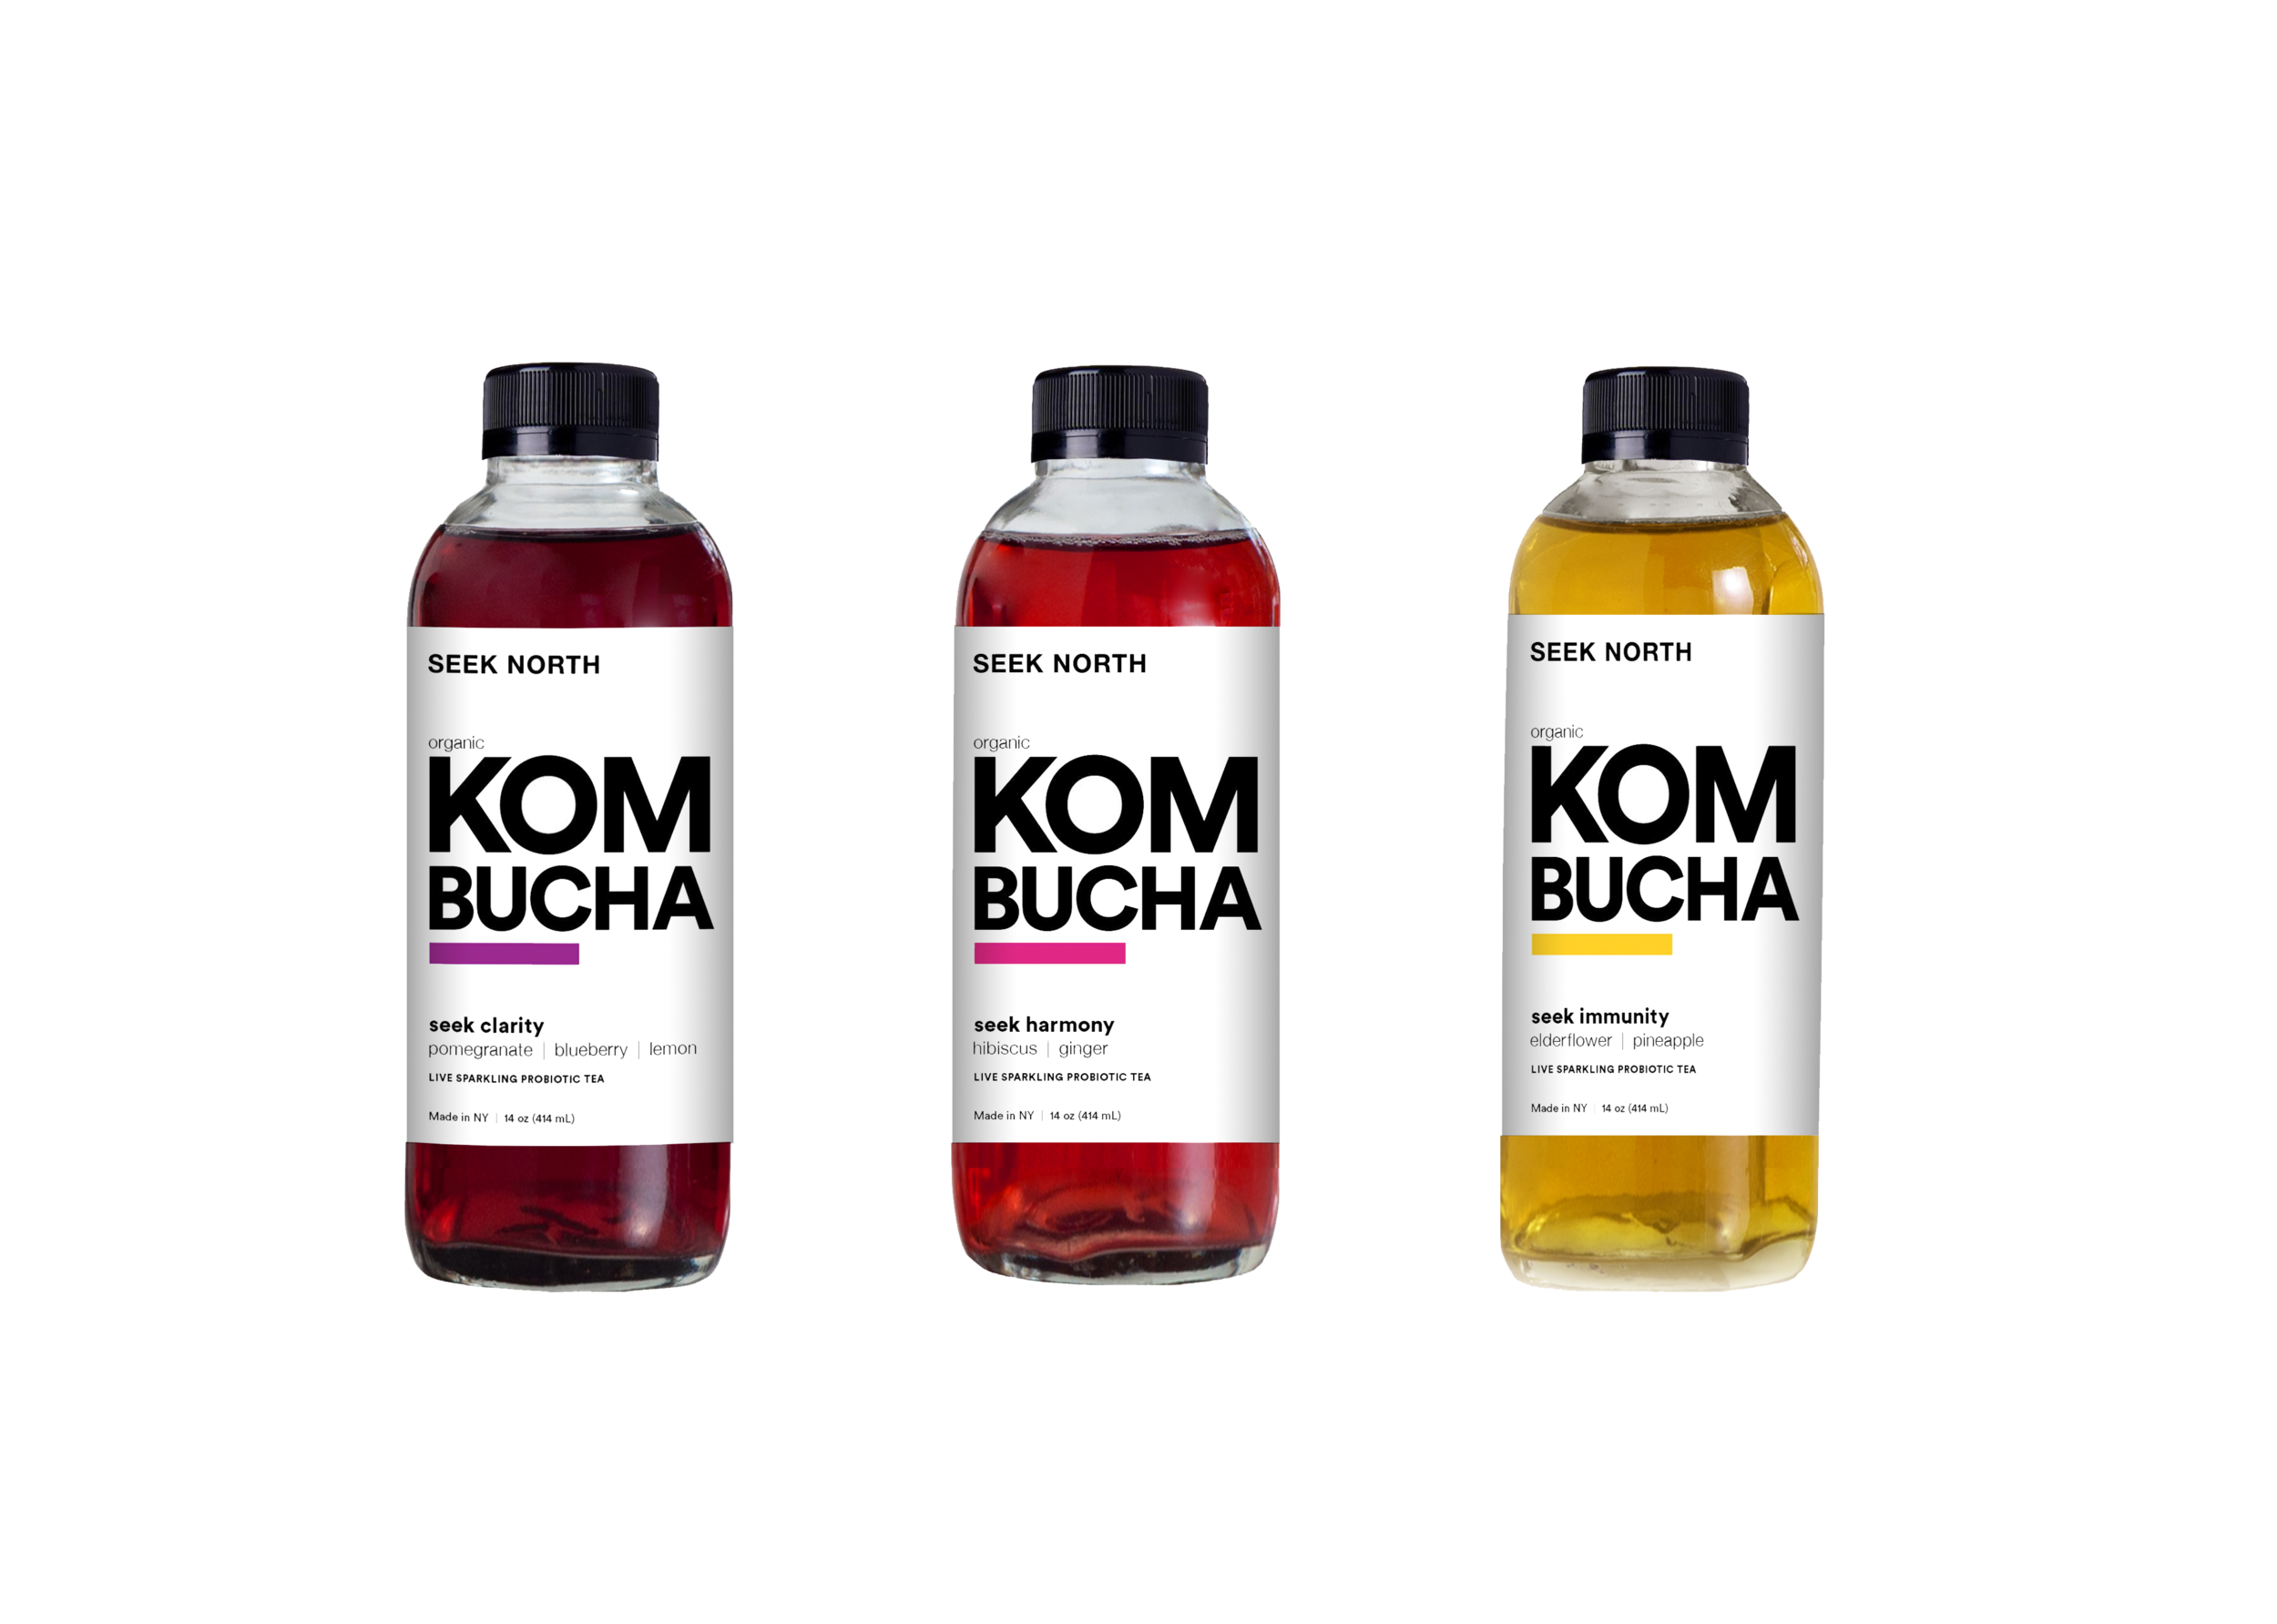 seek north kombucha bottles.png